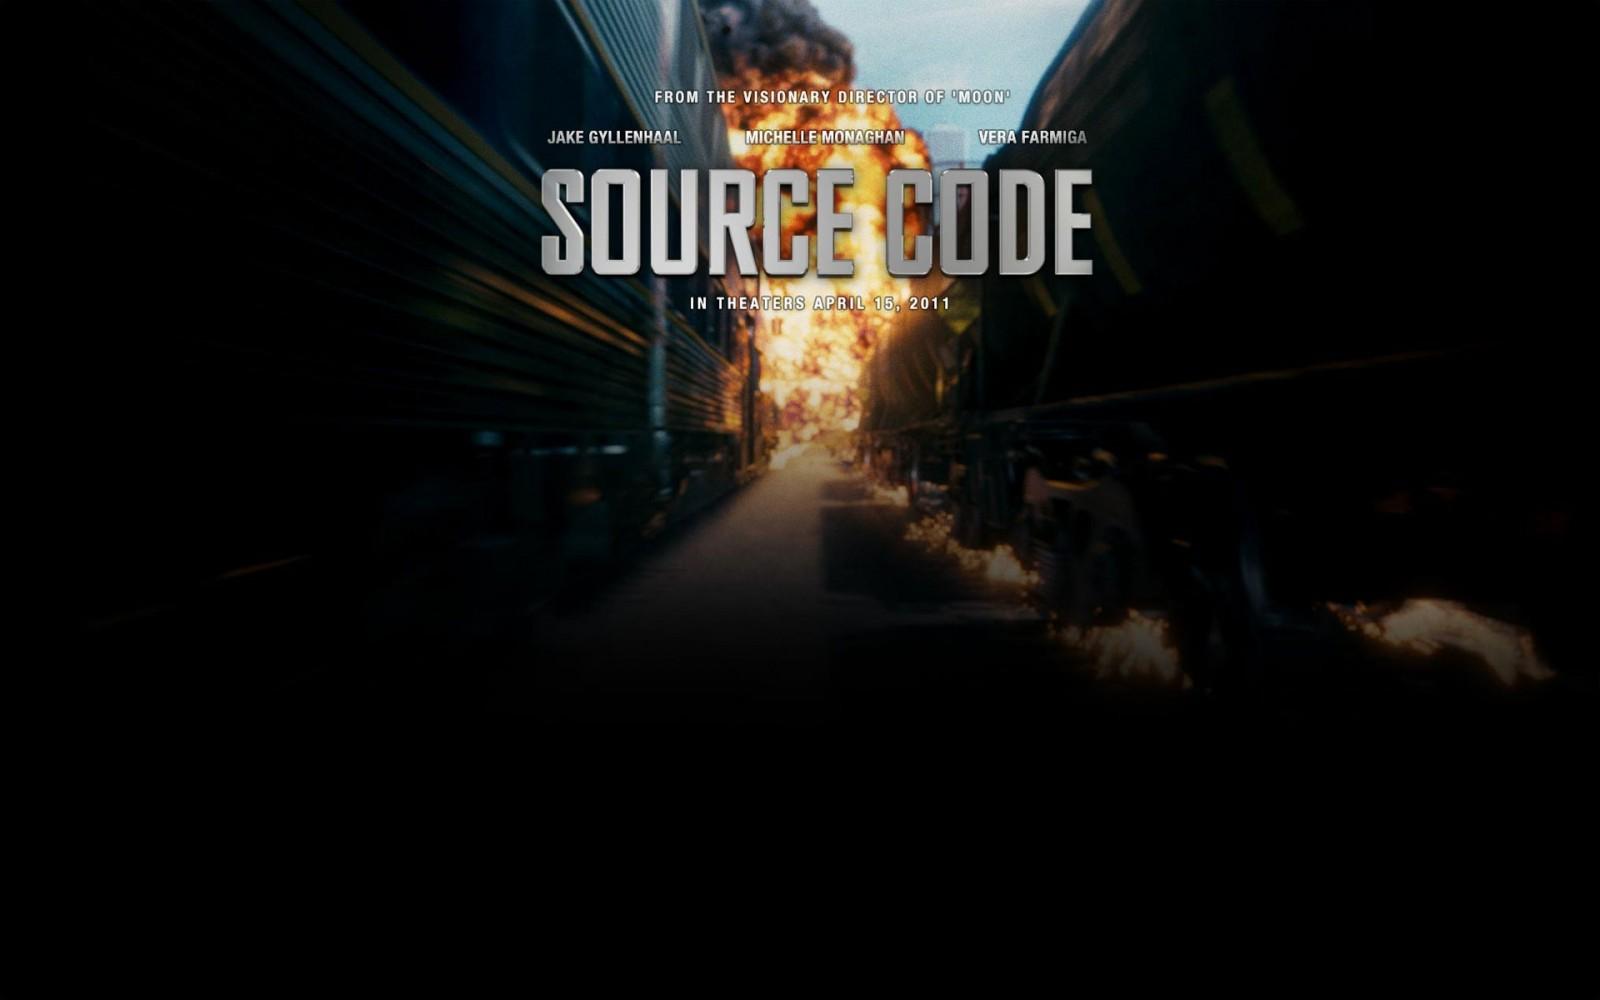 source-code-9076-1920x1200